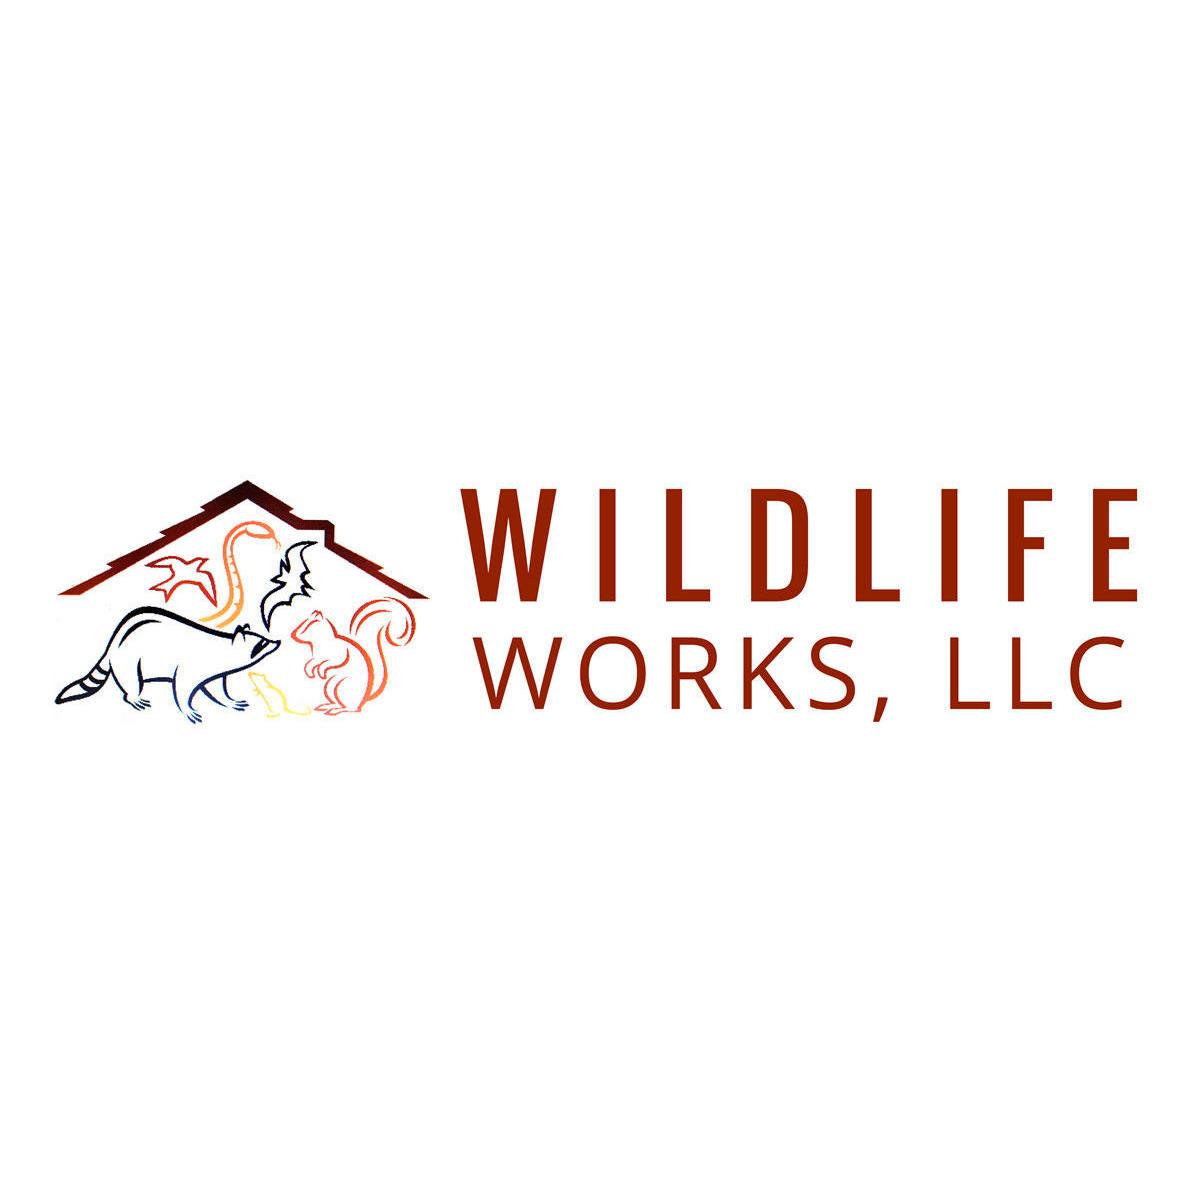 Wildlife Works, LLC